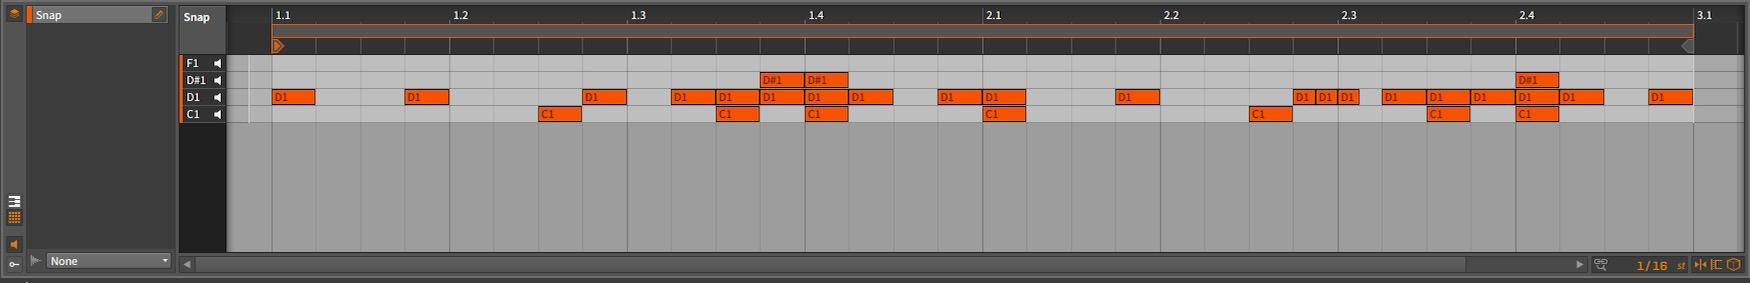 Bitwig Studio - Snap Arrangement [D#1 - Snap]